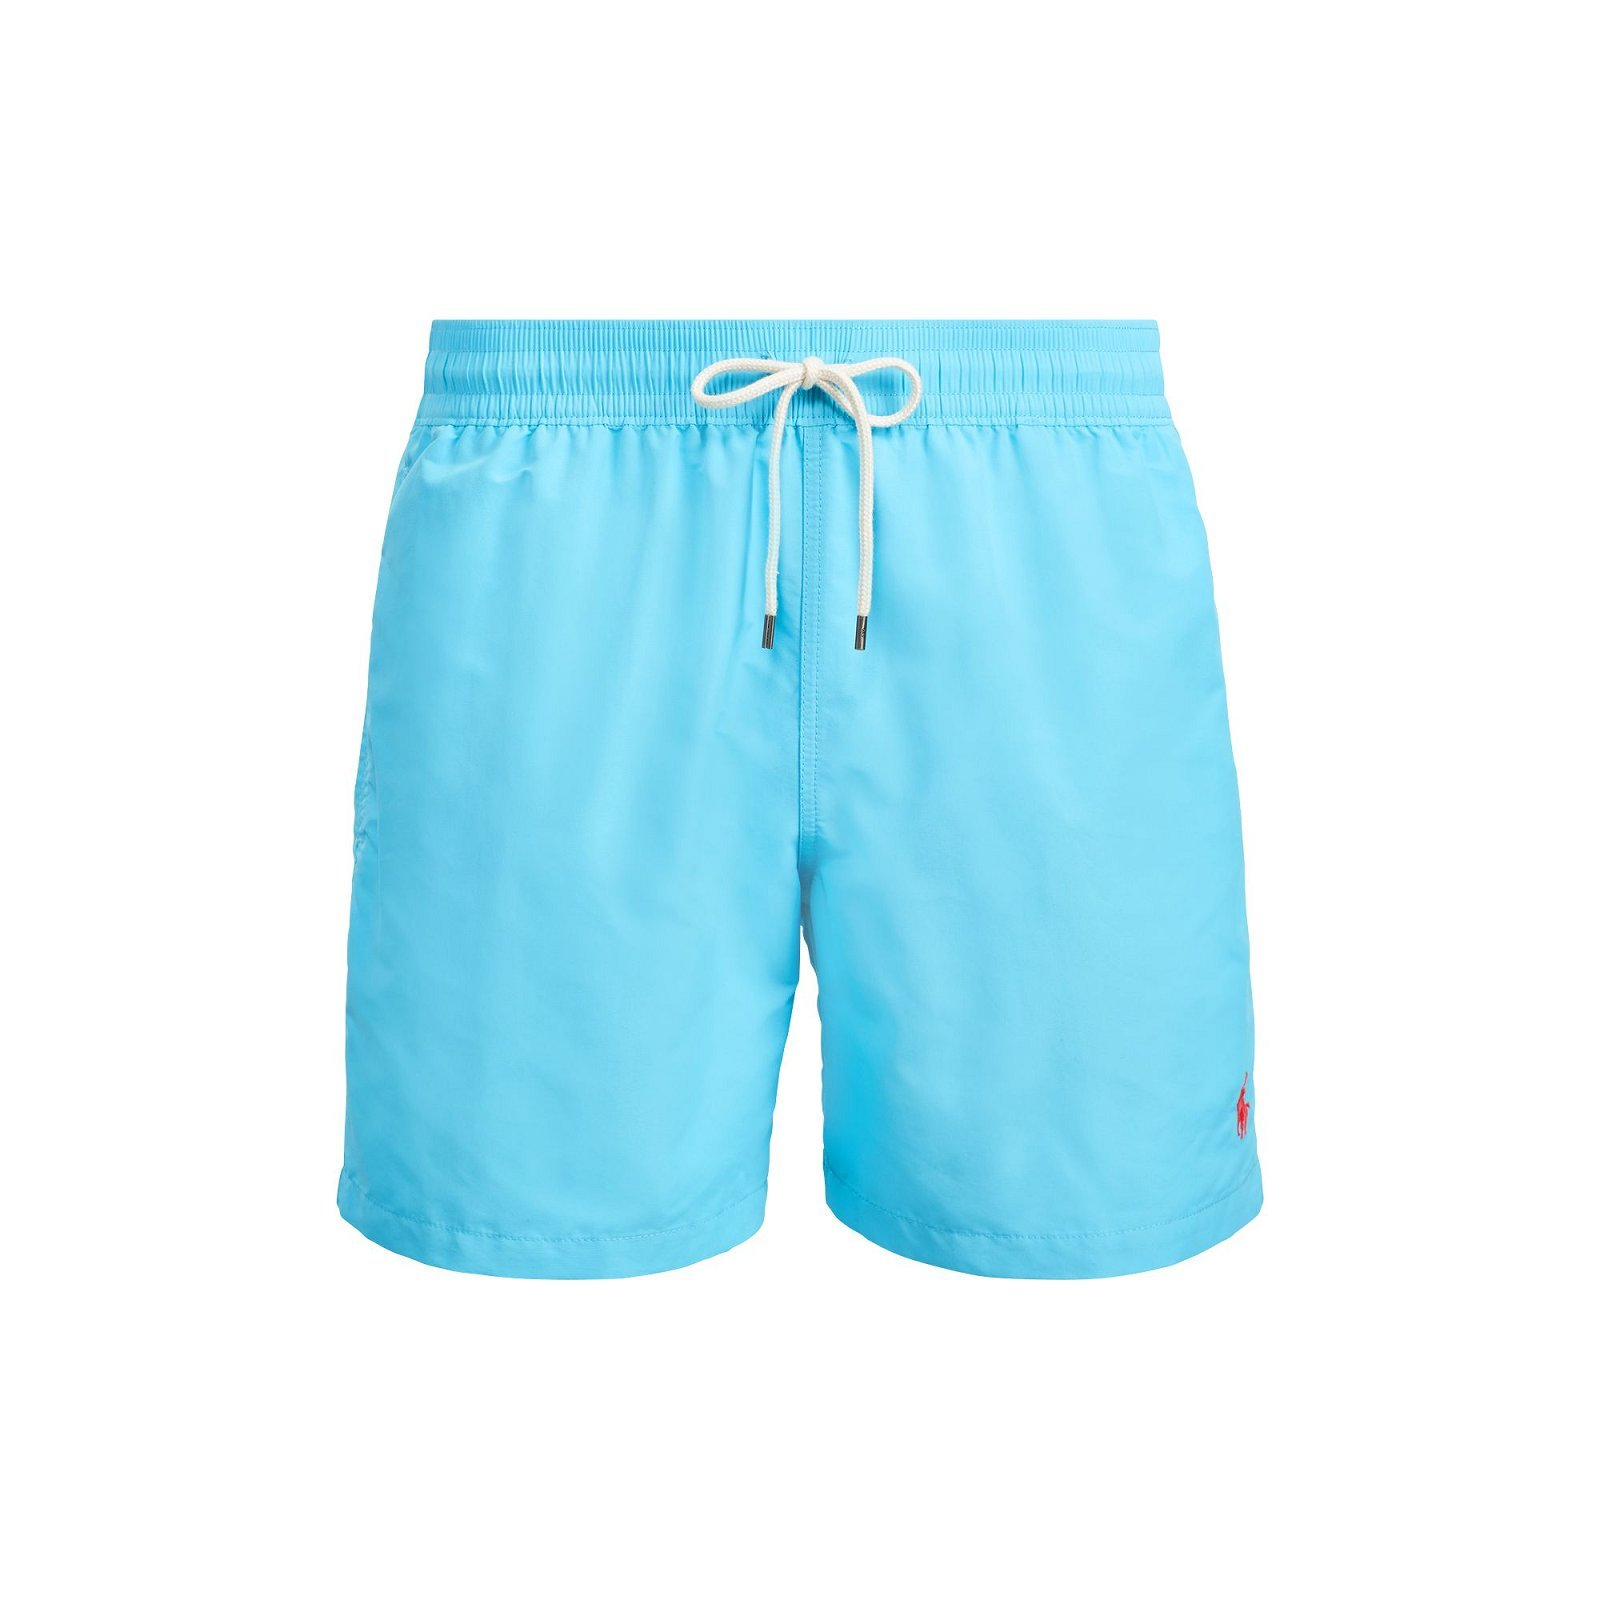 RALPH LAUREN Short de bain turquoise - 710683997013 , Maillot de ... 9939a8ee654